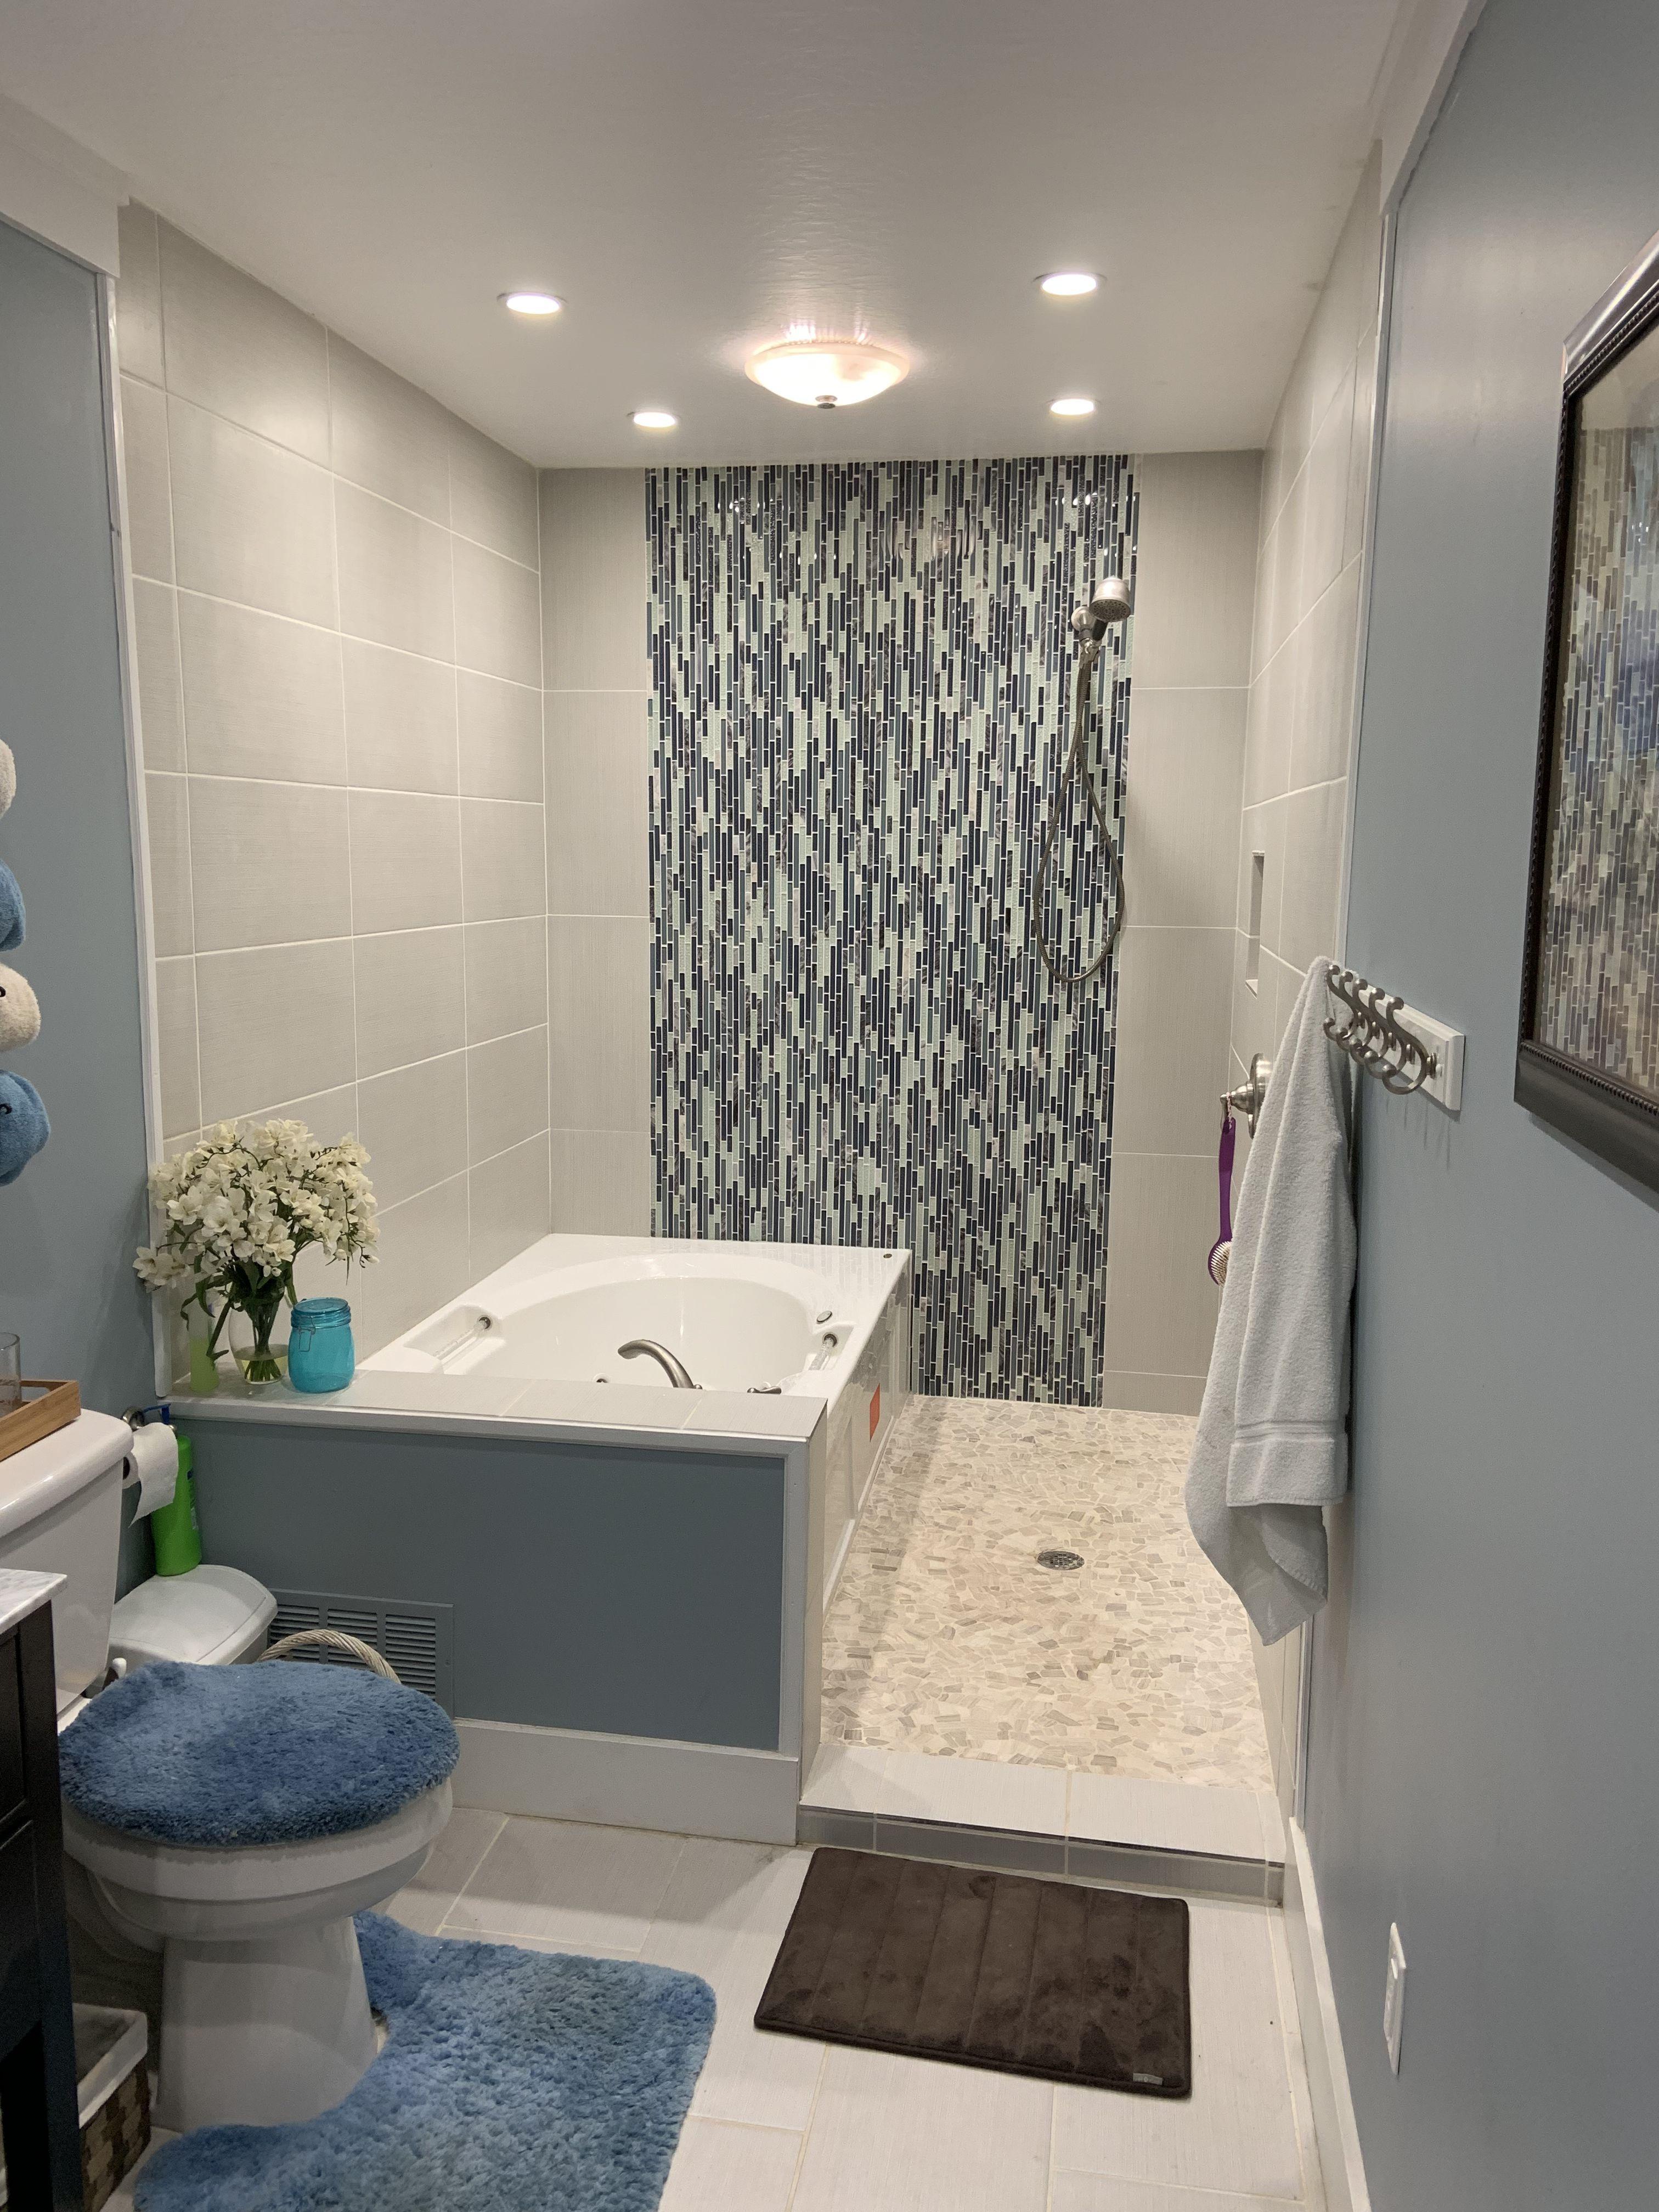 My Shower Jacuzzi Tub Combo Beautifully Tiled The Waterfall Bathroom Masterbathjacuzzitubs Bathroom Design Luxury Bathroom Sink Design Tub Shower Combo